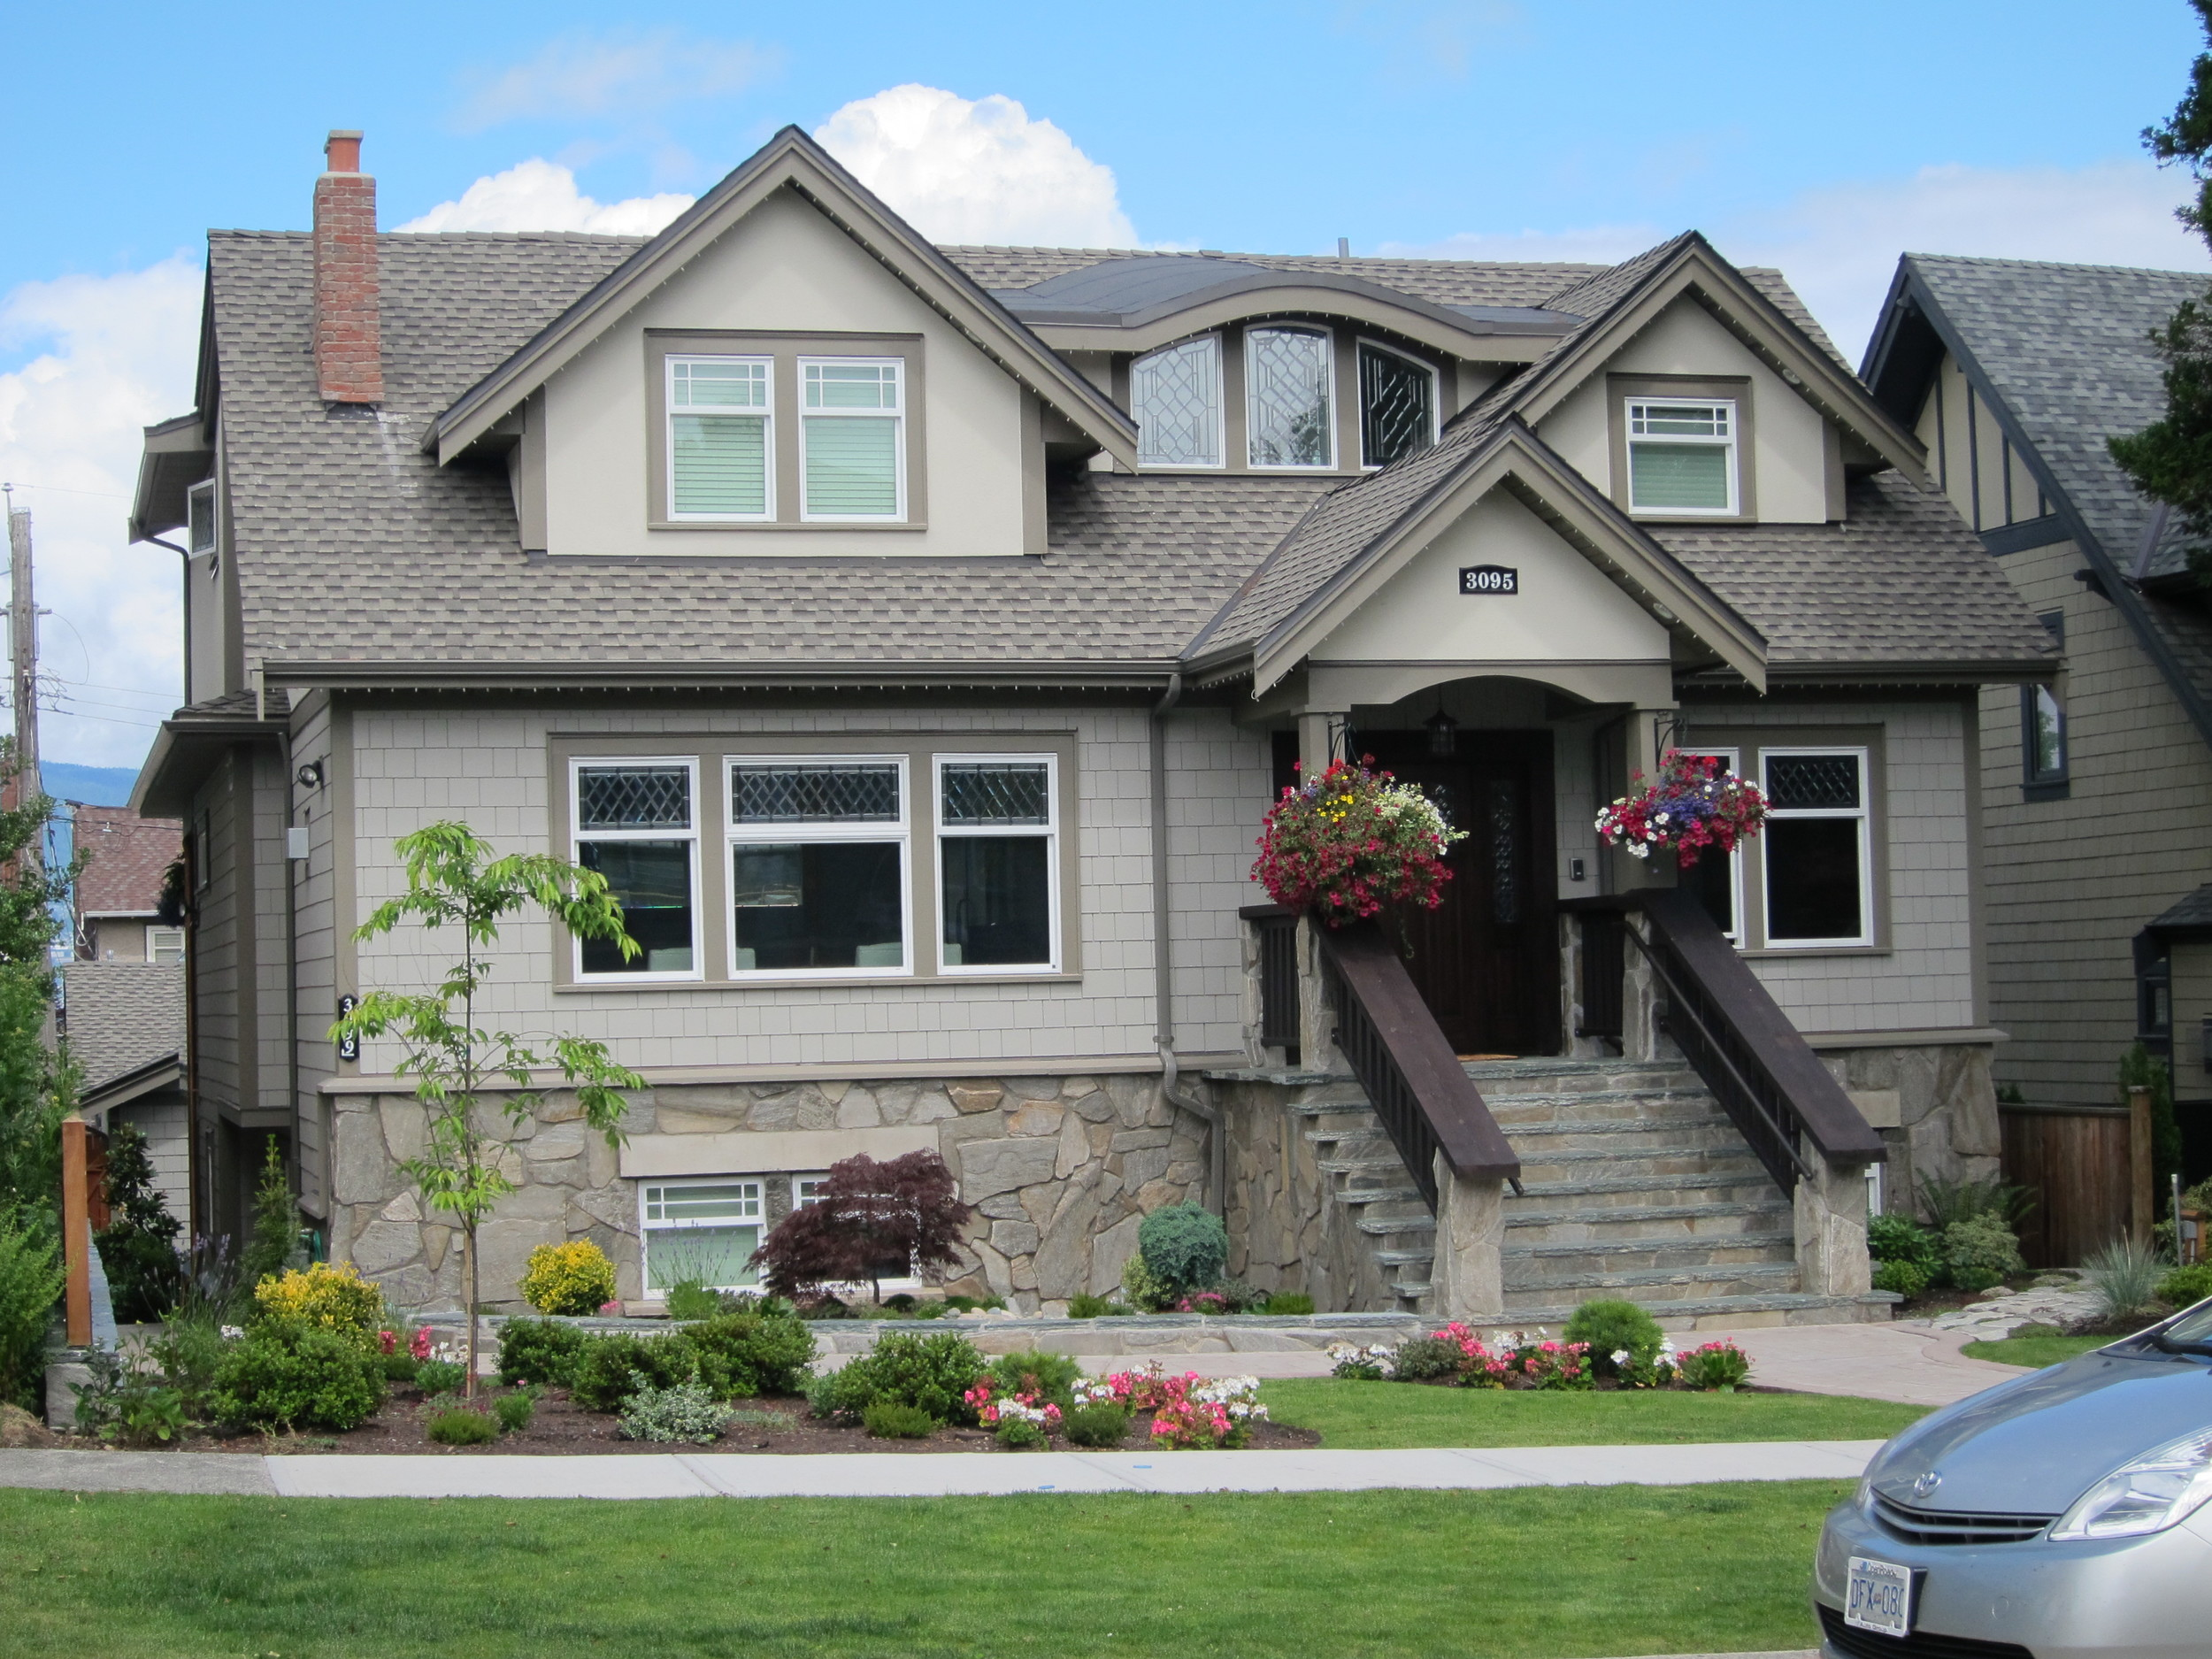 3095-W.-24th-Ave.-Vancouver-GAF-Timberline-Prestique-LT.-Weathered-Wood_WhyChoose-Crown.jpg